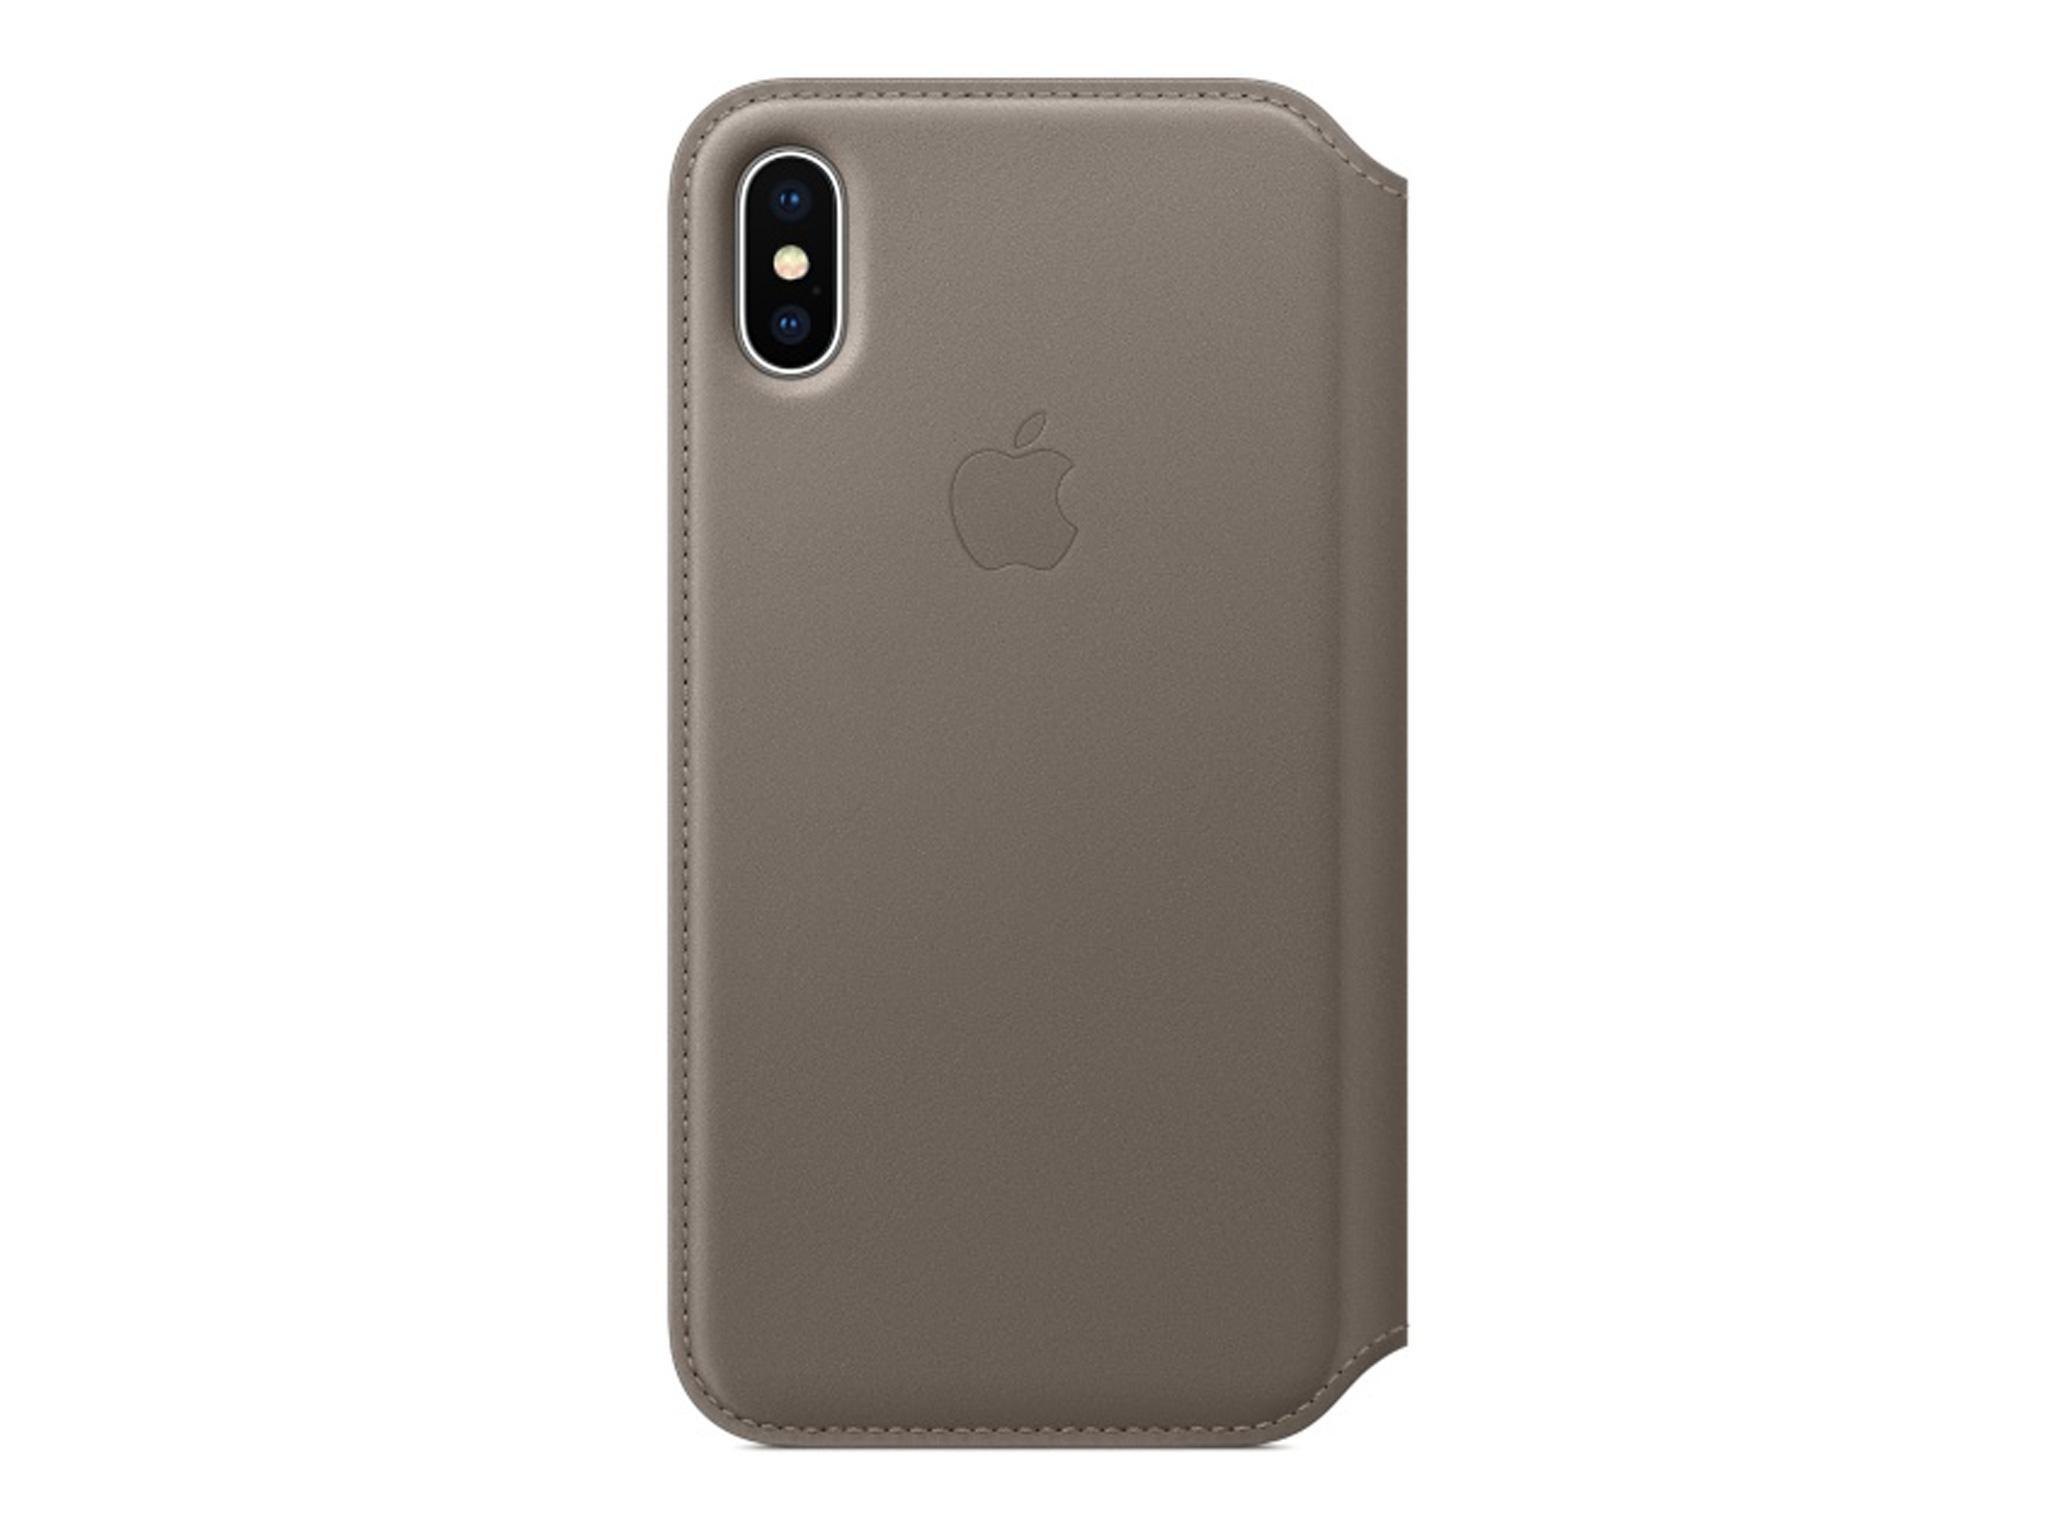 14 Best Iphone X Cases The Independent Spigen Case Air Skin Black Apple Leather Folio 99 Store